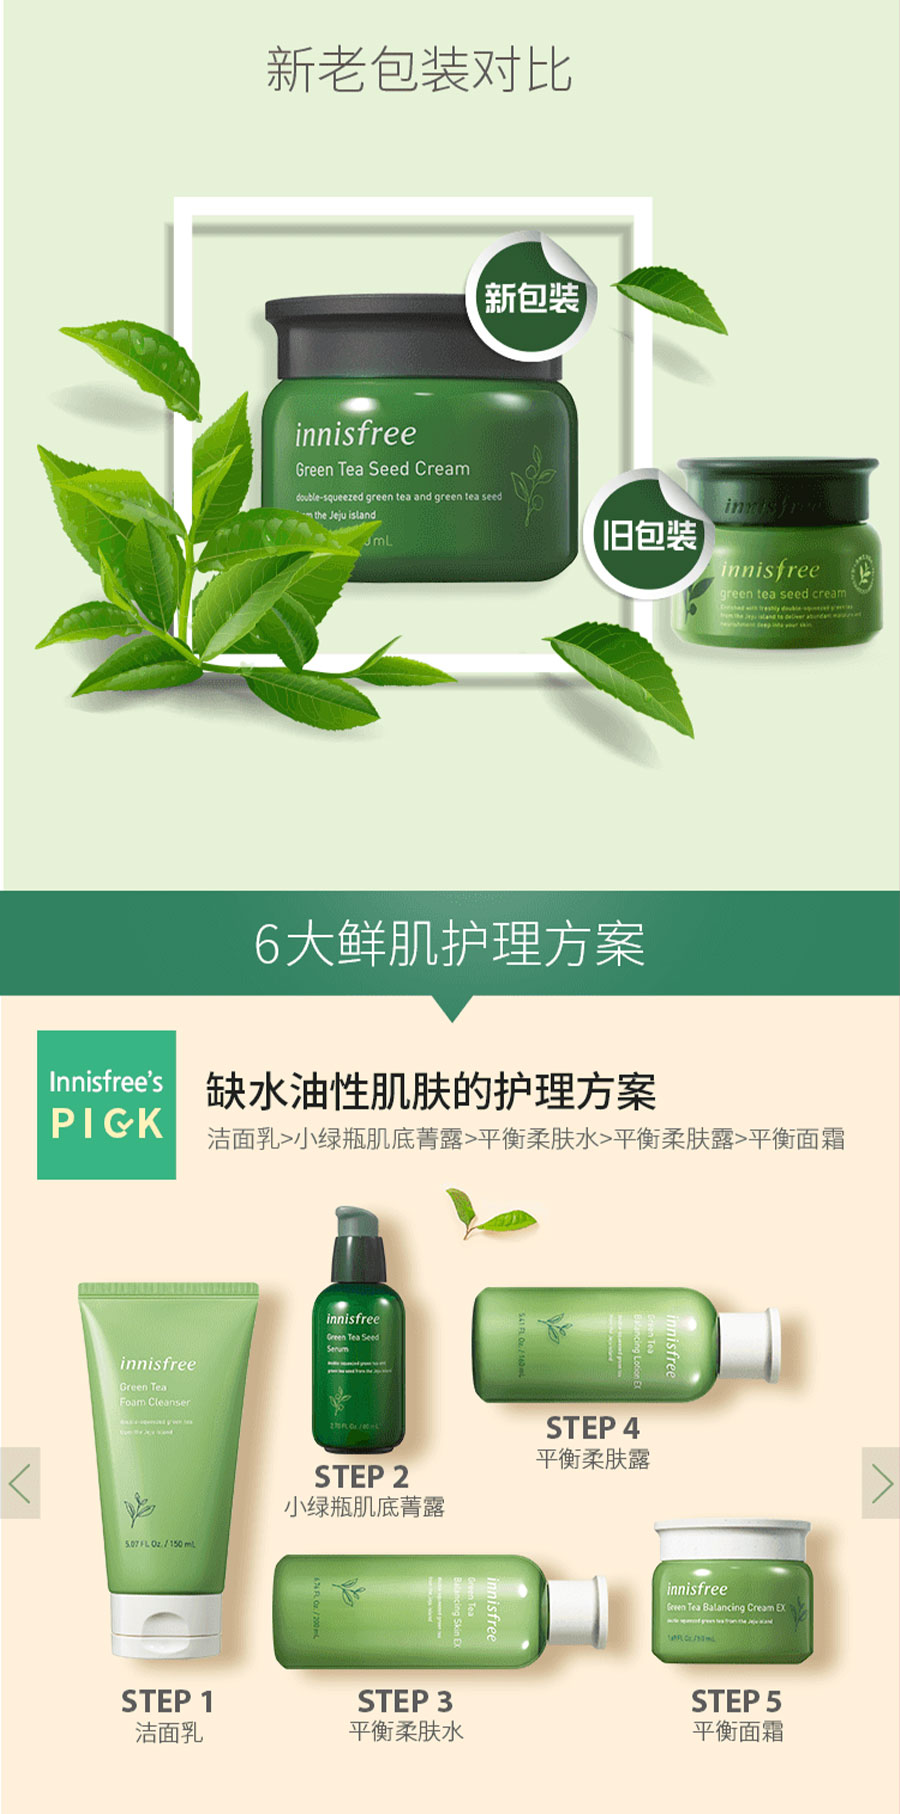 Green Tea Seed Cream - Type